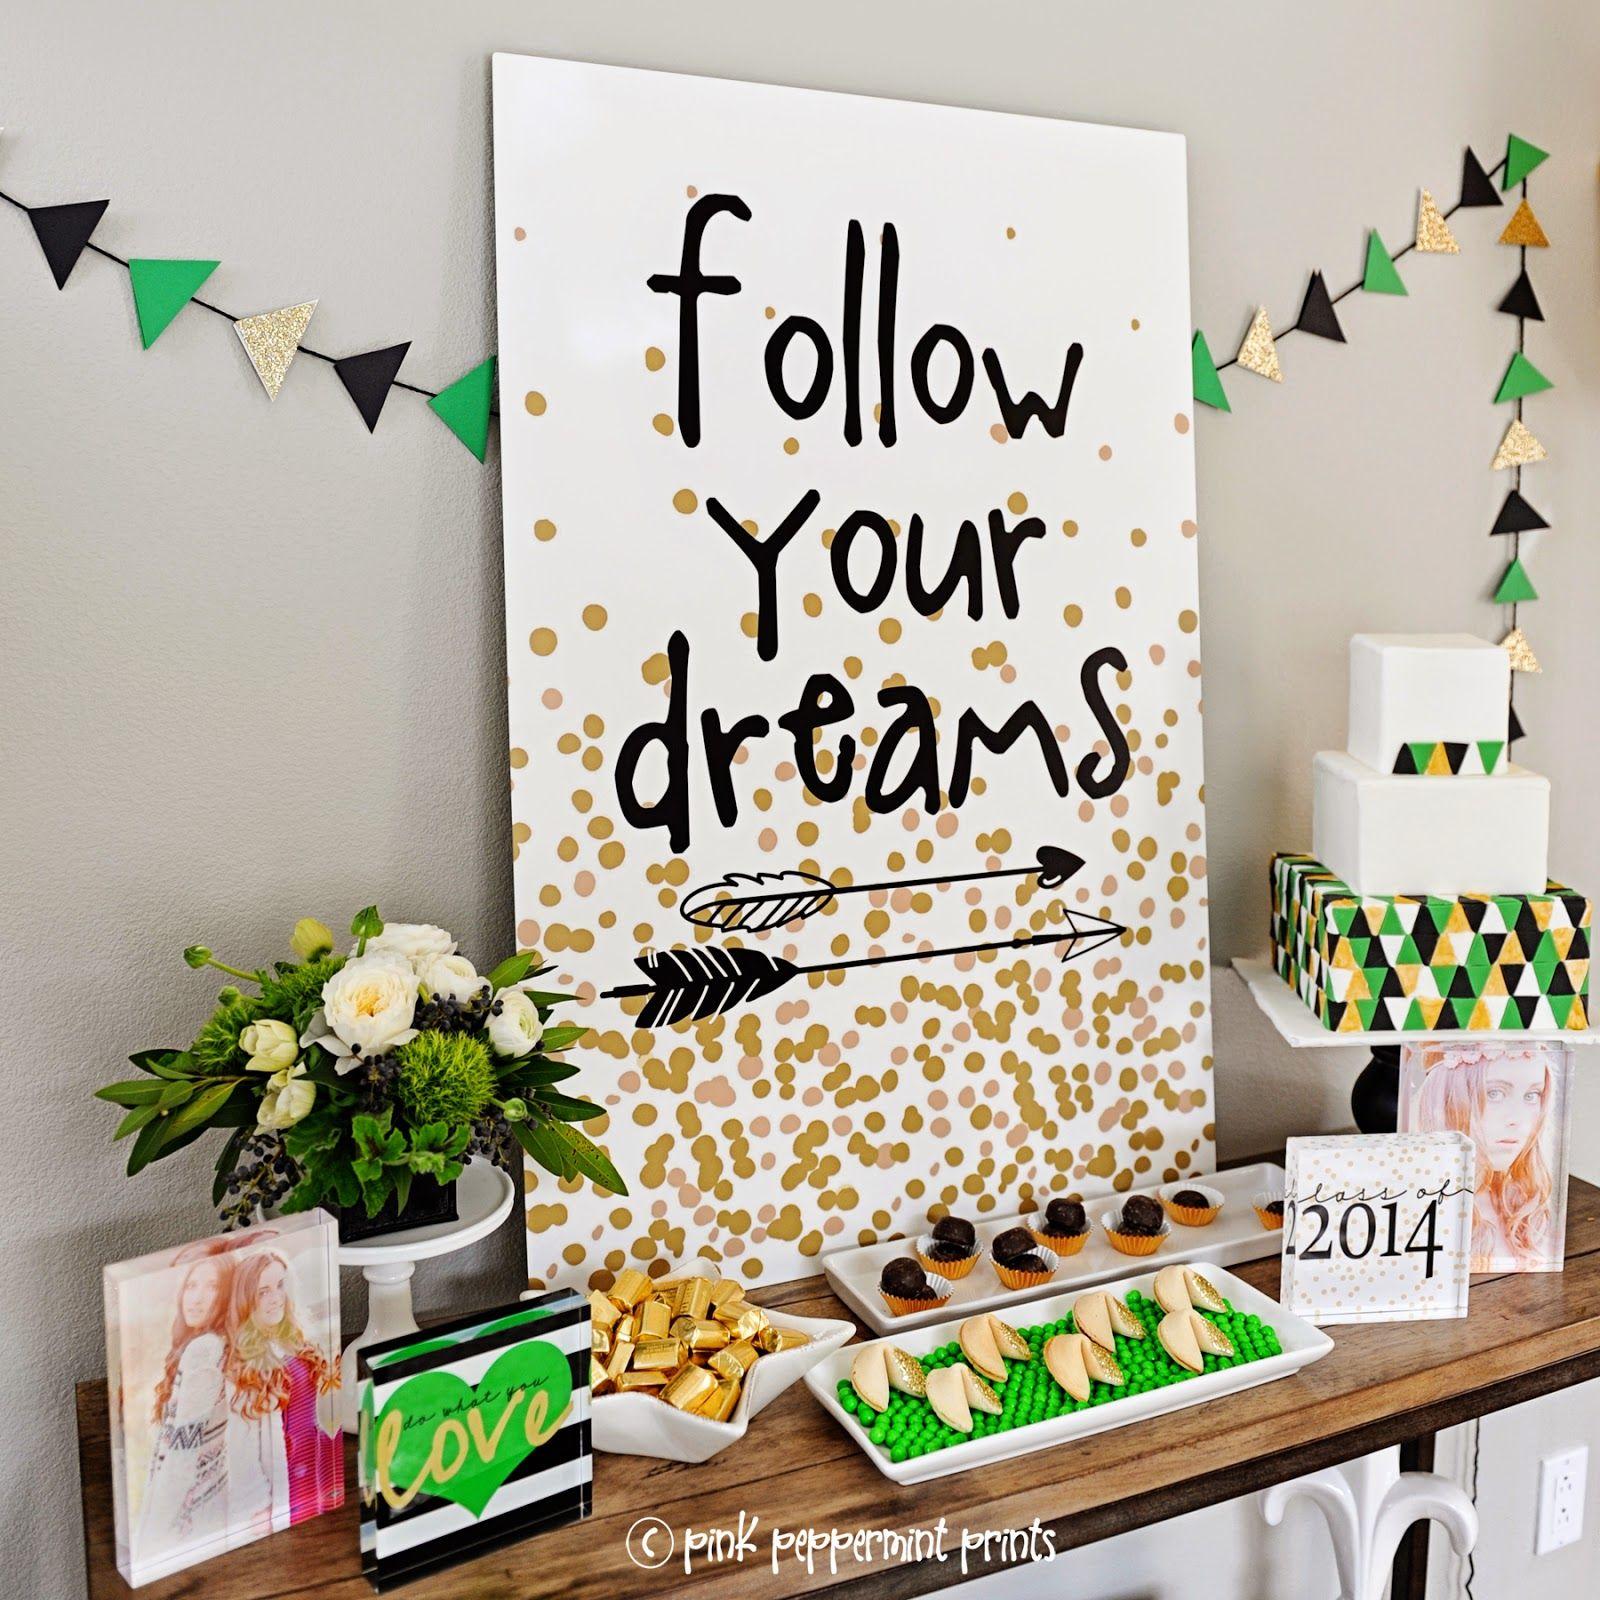 2014 graduation decorations - 10 Fun Graduation Ideas